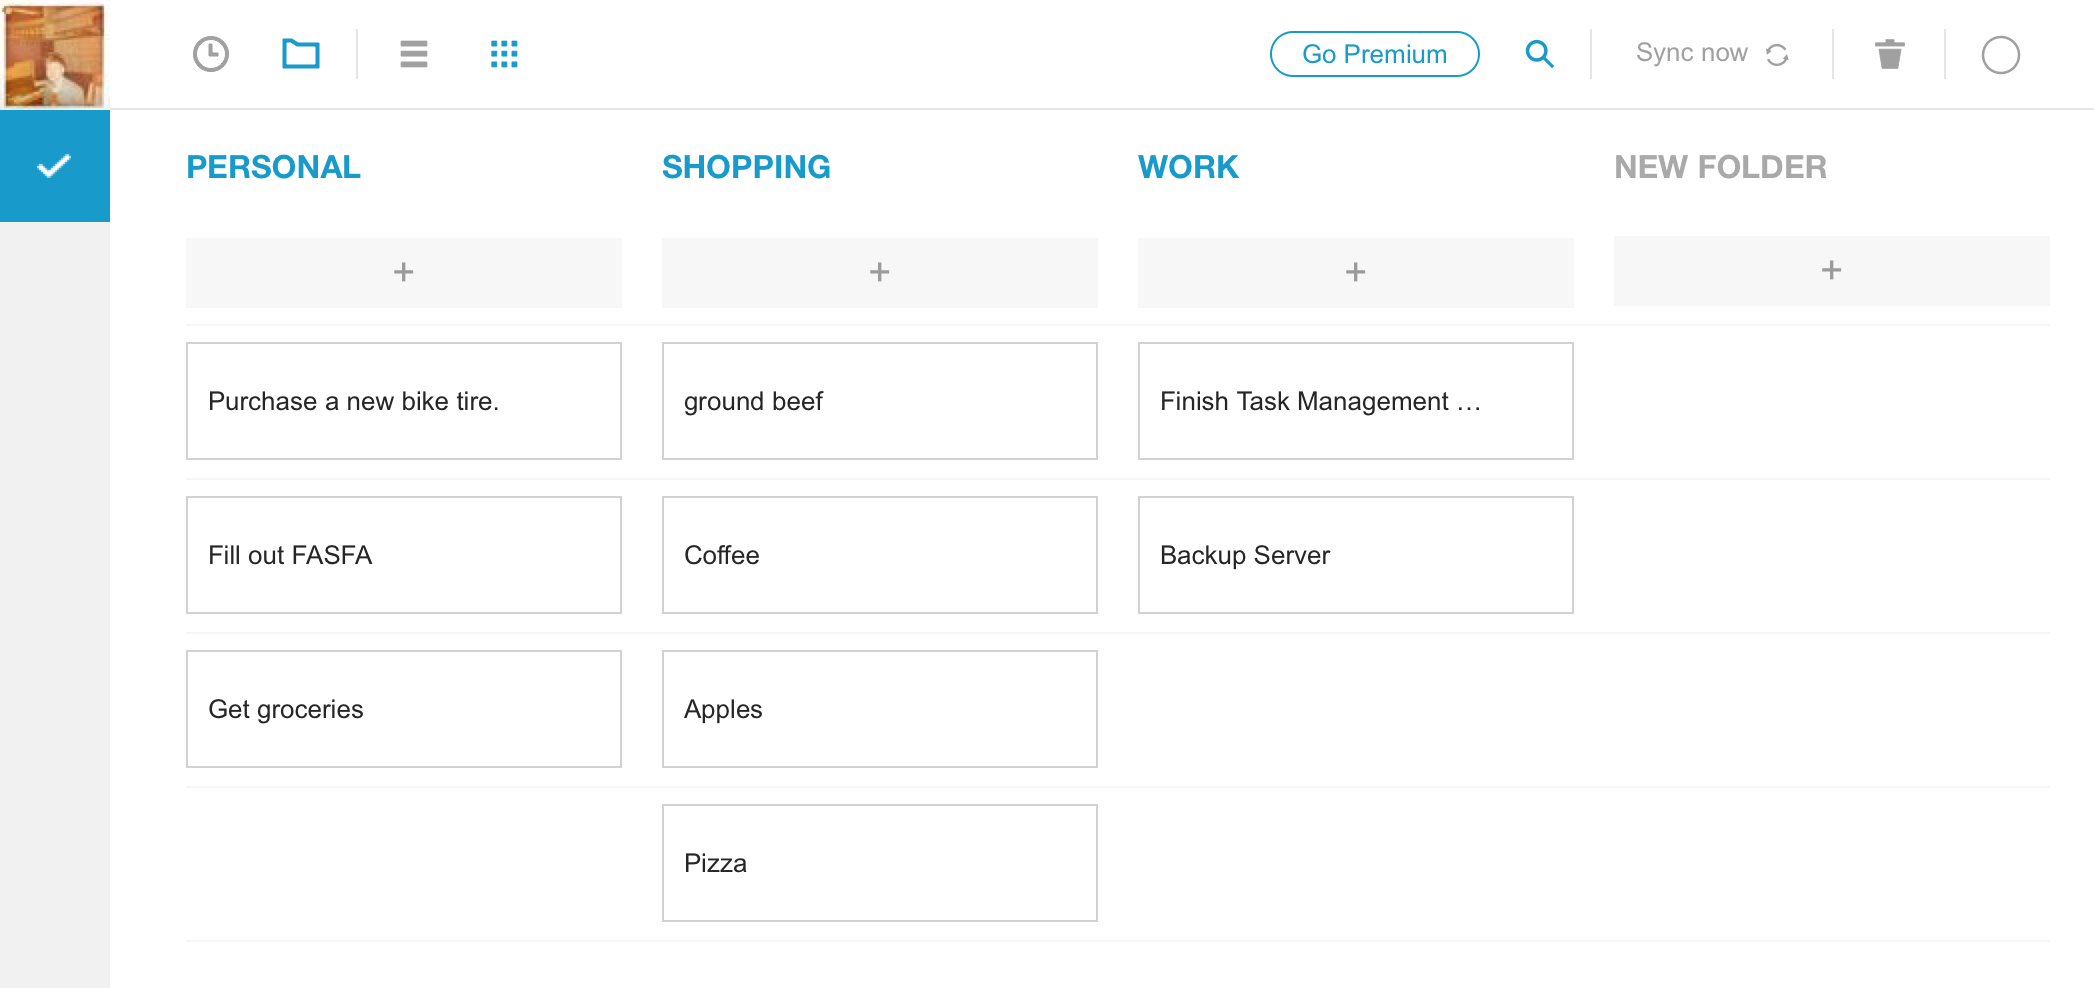 Job Management Spreadsheet Intended For The 40 Best Todo List Apps For Task Management Job Management Spreadsheet Google Spreadshee Google Spreadshee job sheet management system